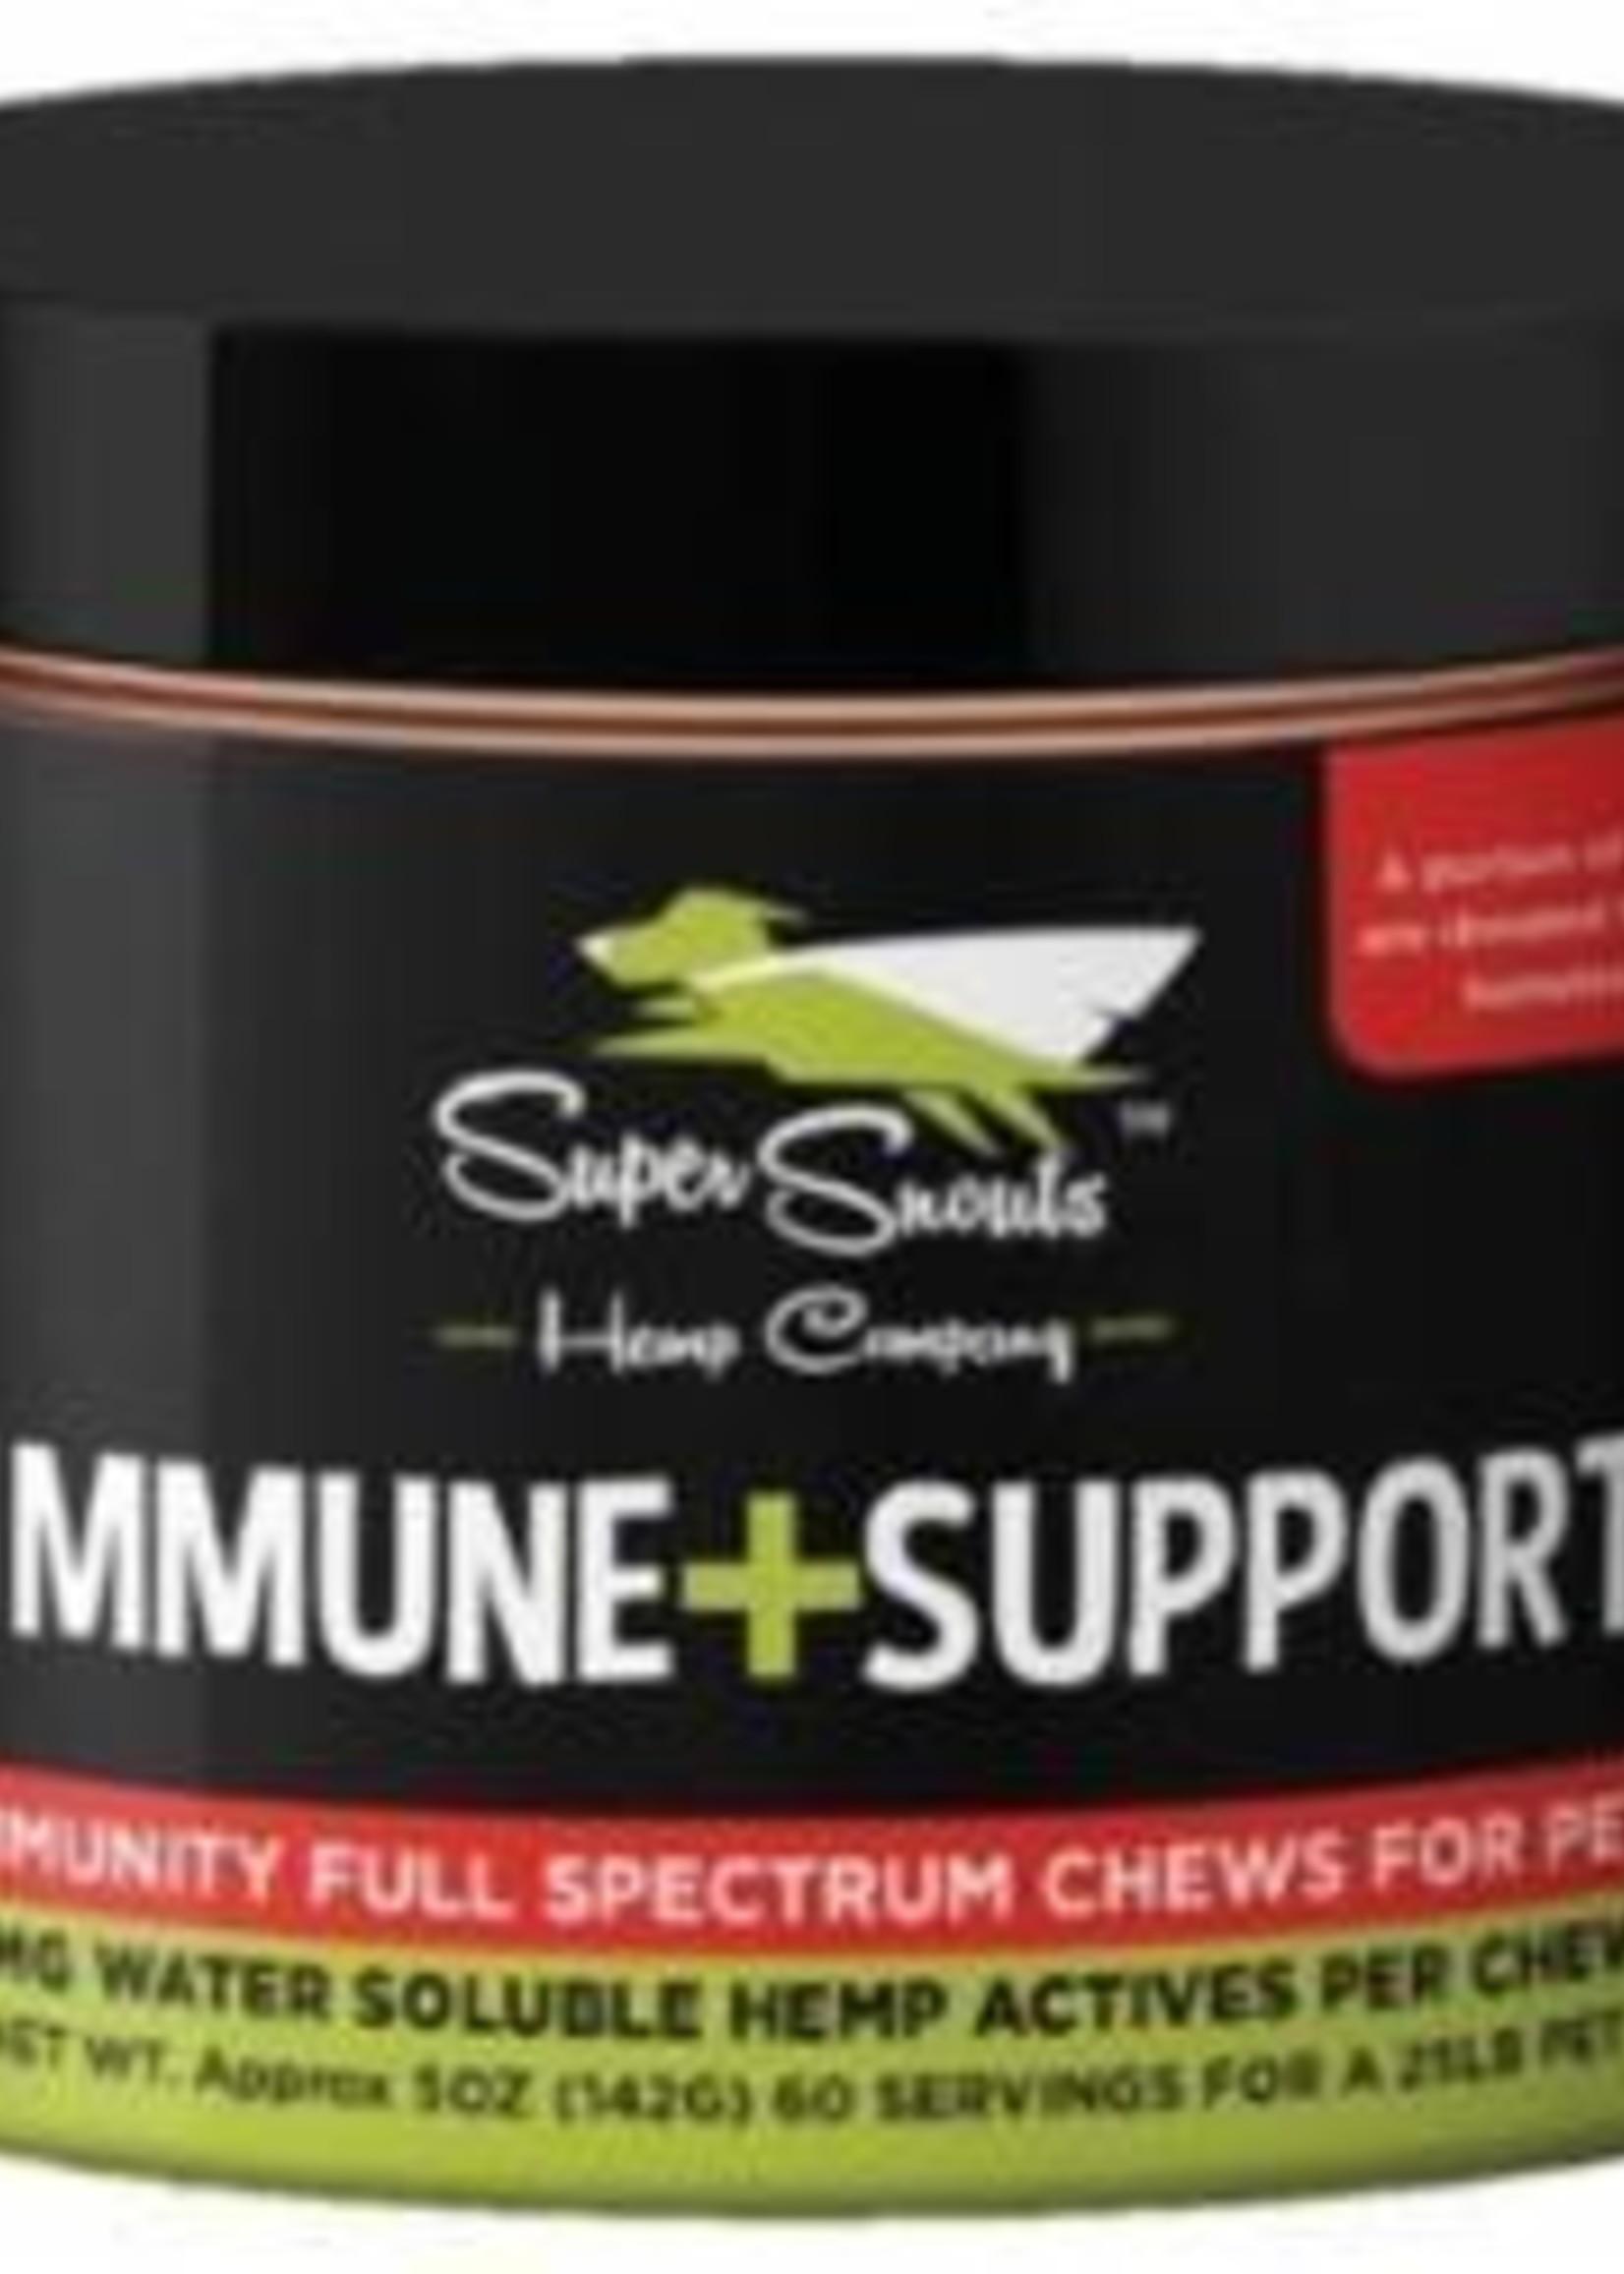 Super Snouts Super Snouts Hemp Dog Full Spectrum Chew Immune Support 30ct